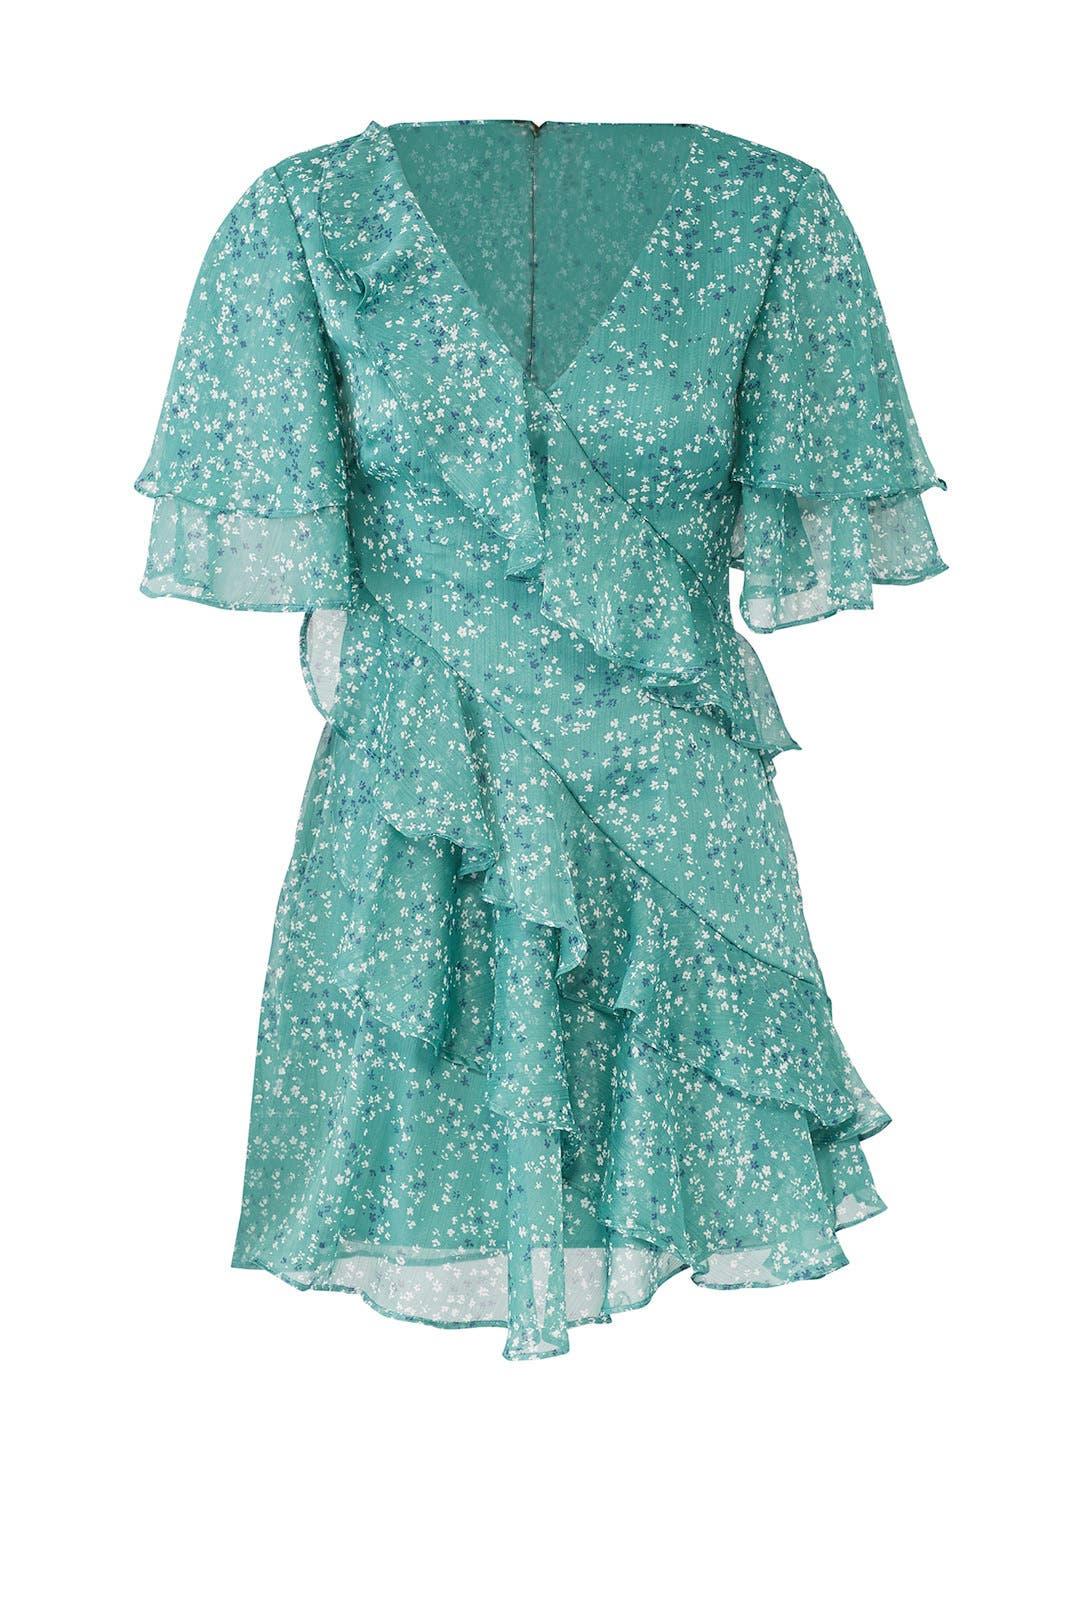 Keepsake. Read Reviews. Genesis Mini Dress 212b5edd5